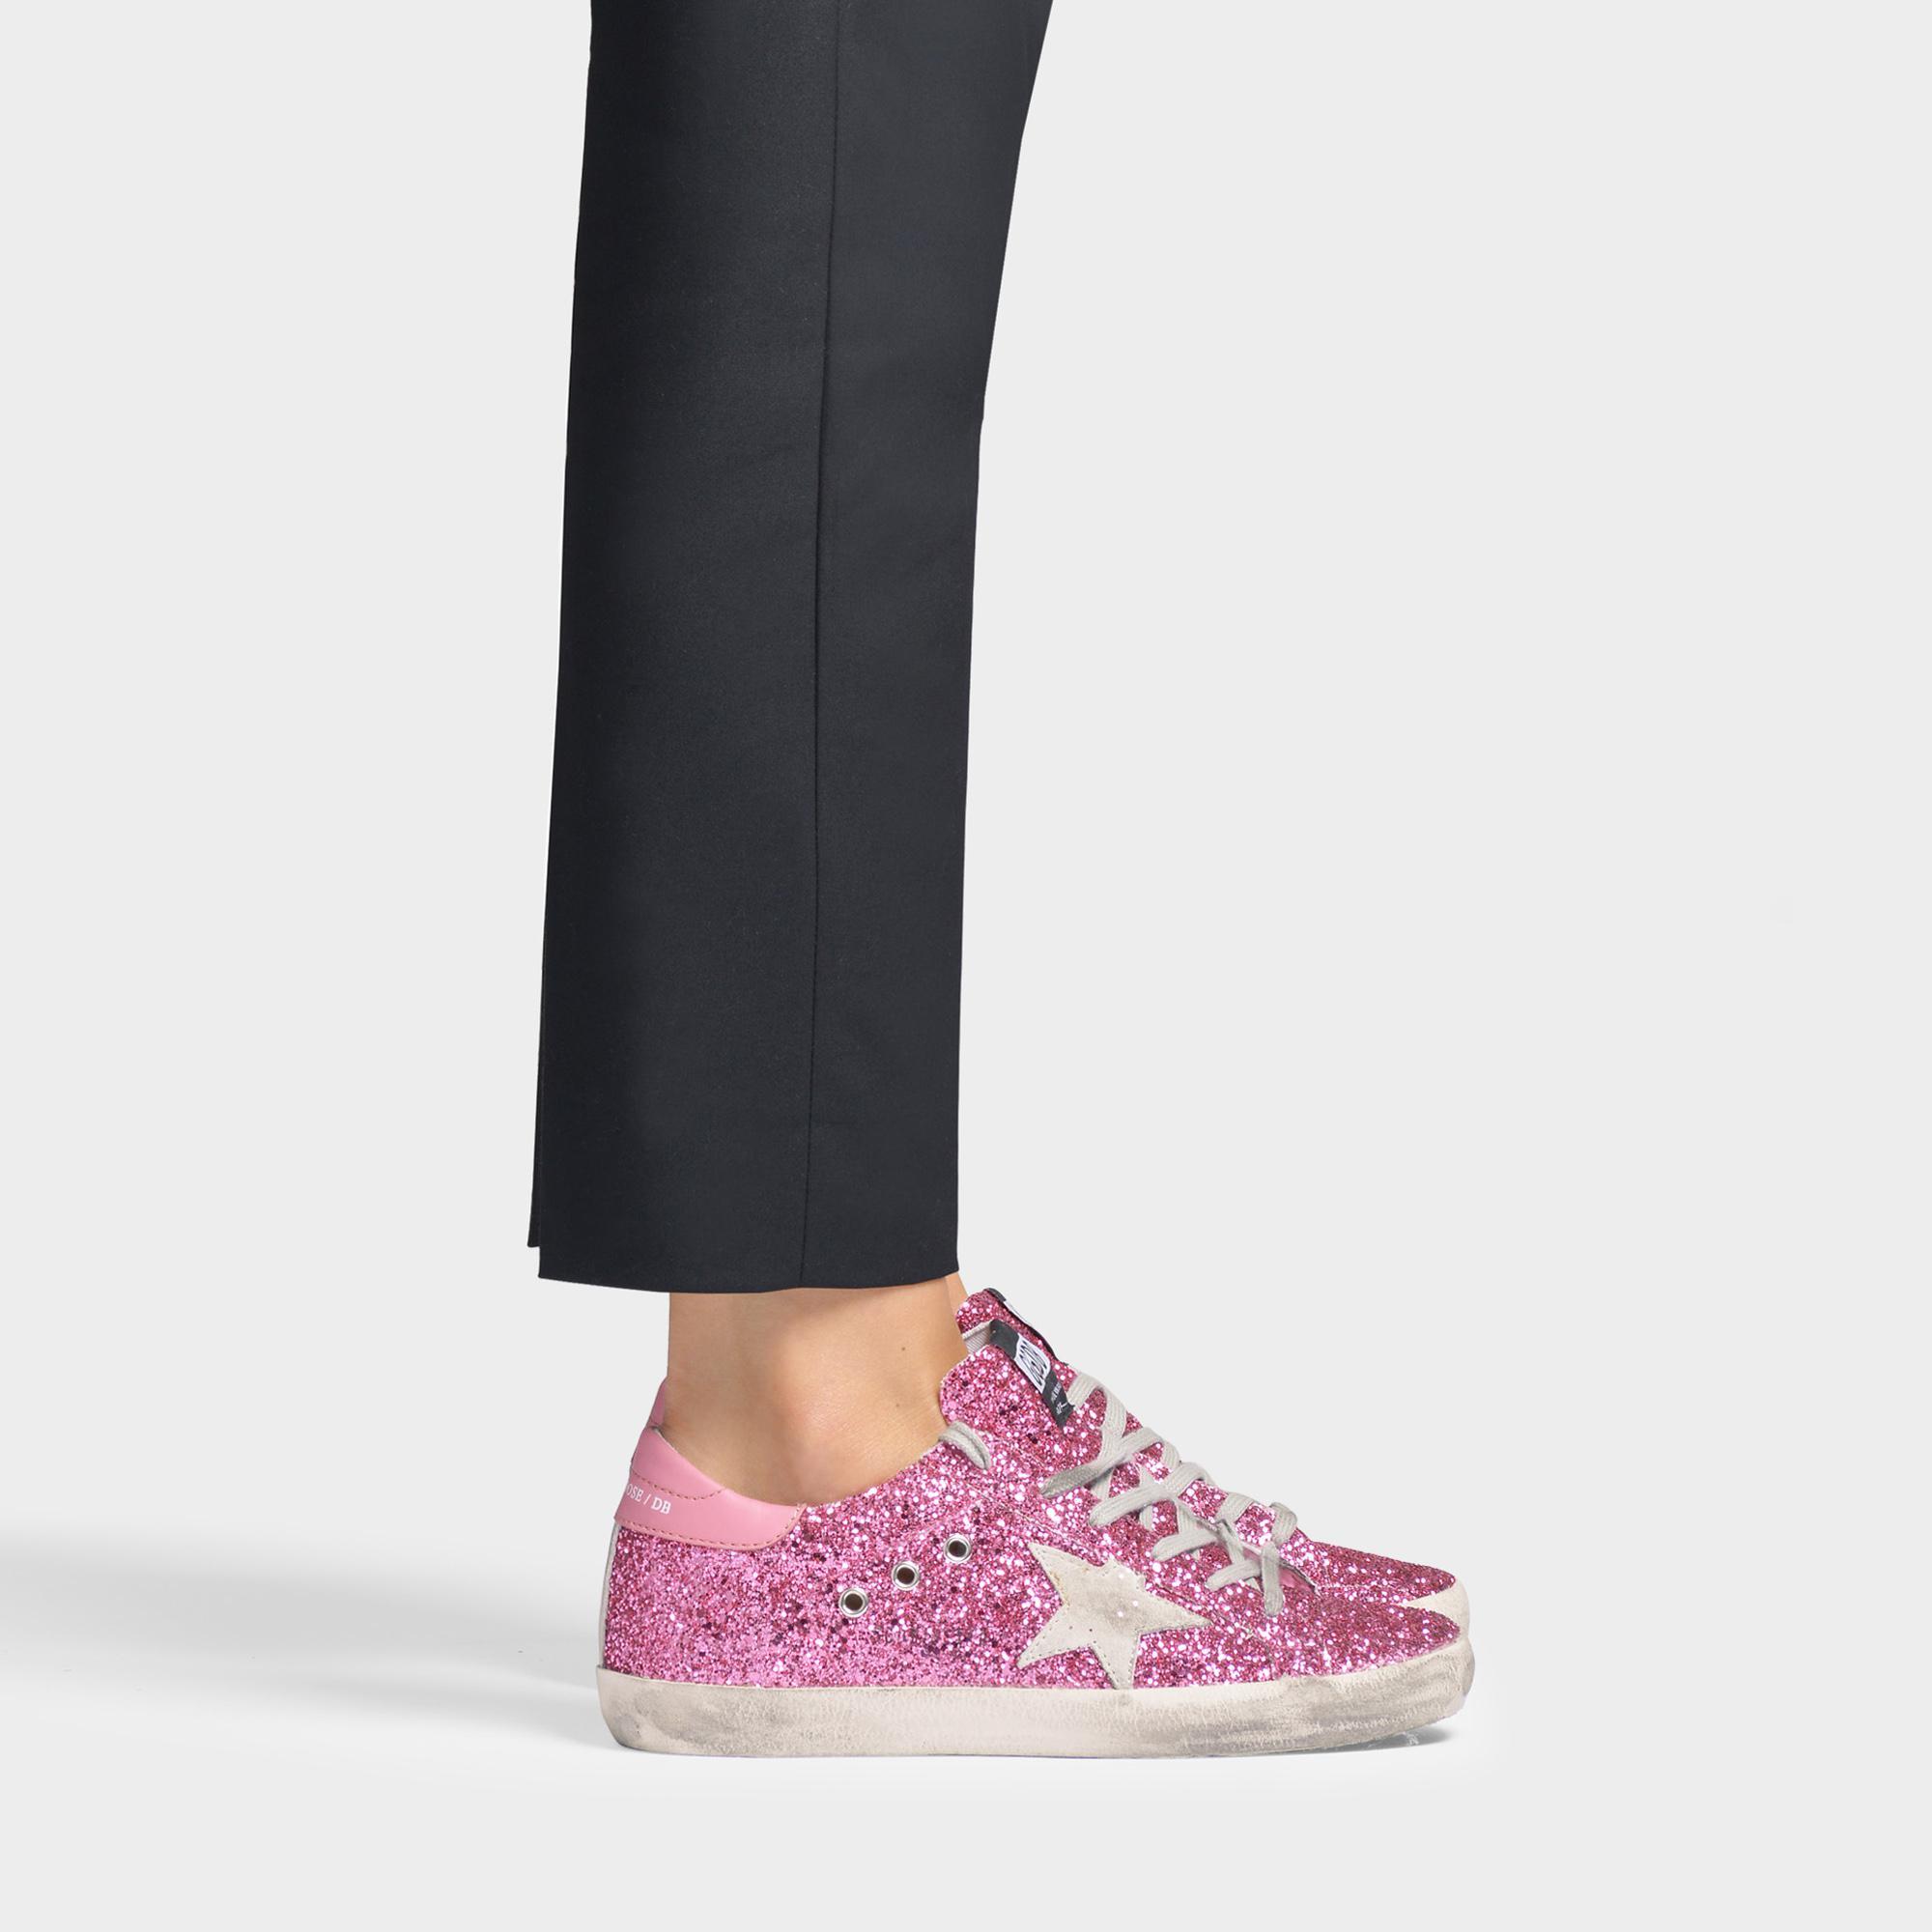 Golden Goose Leather Superstar Sneakers In Pink Glitter Calfskin ...